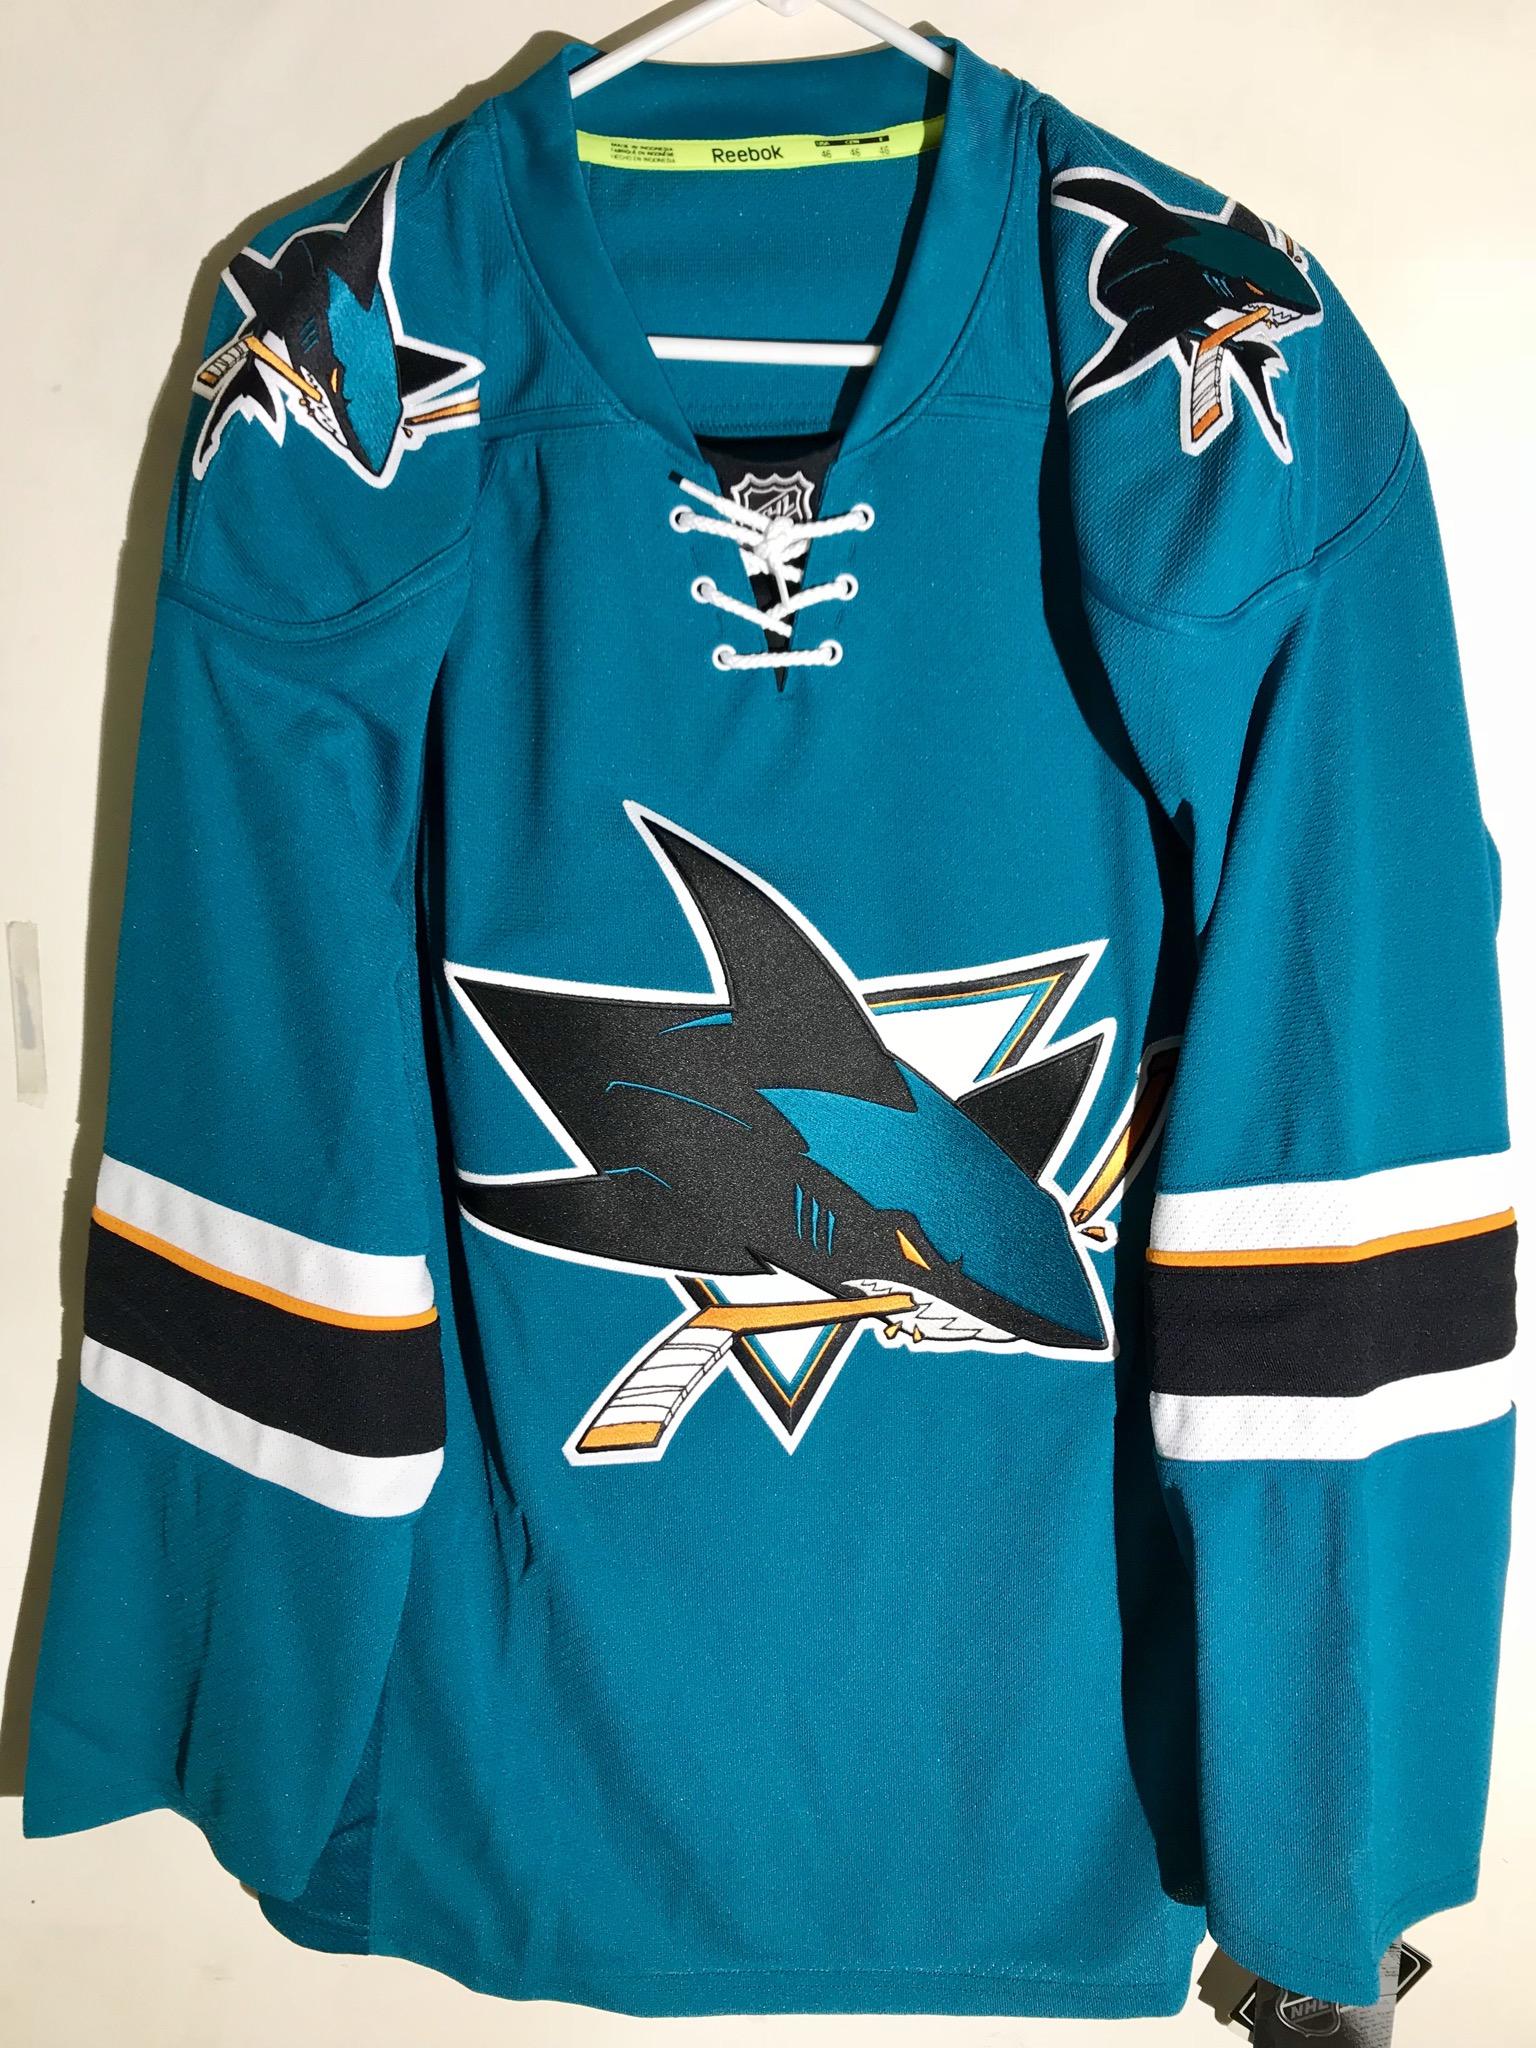 05904cadc Reebok Authentic NHL Jersey San Jose Sharks Team Teal sz 50